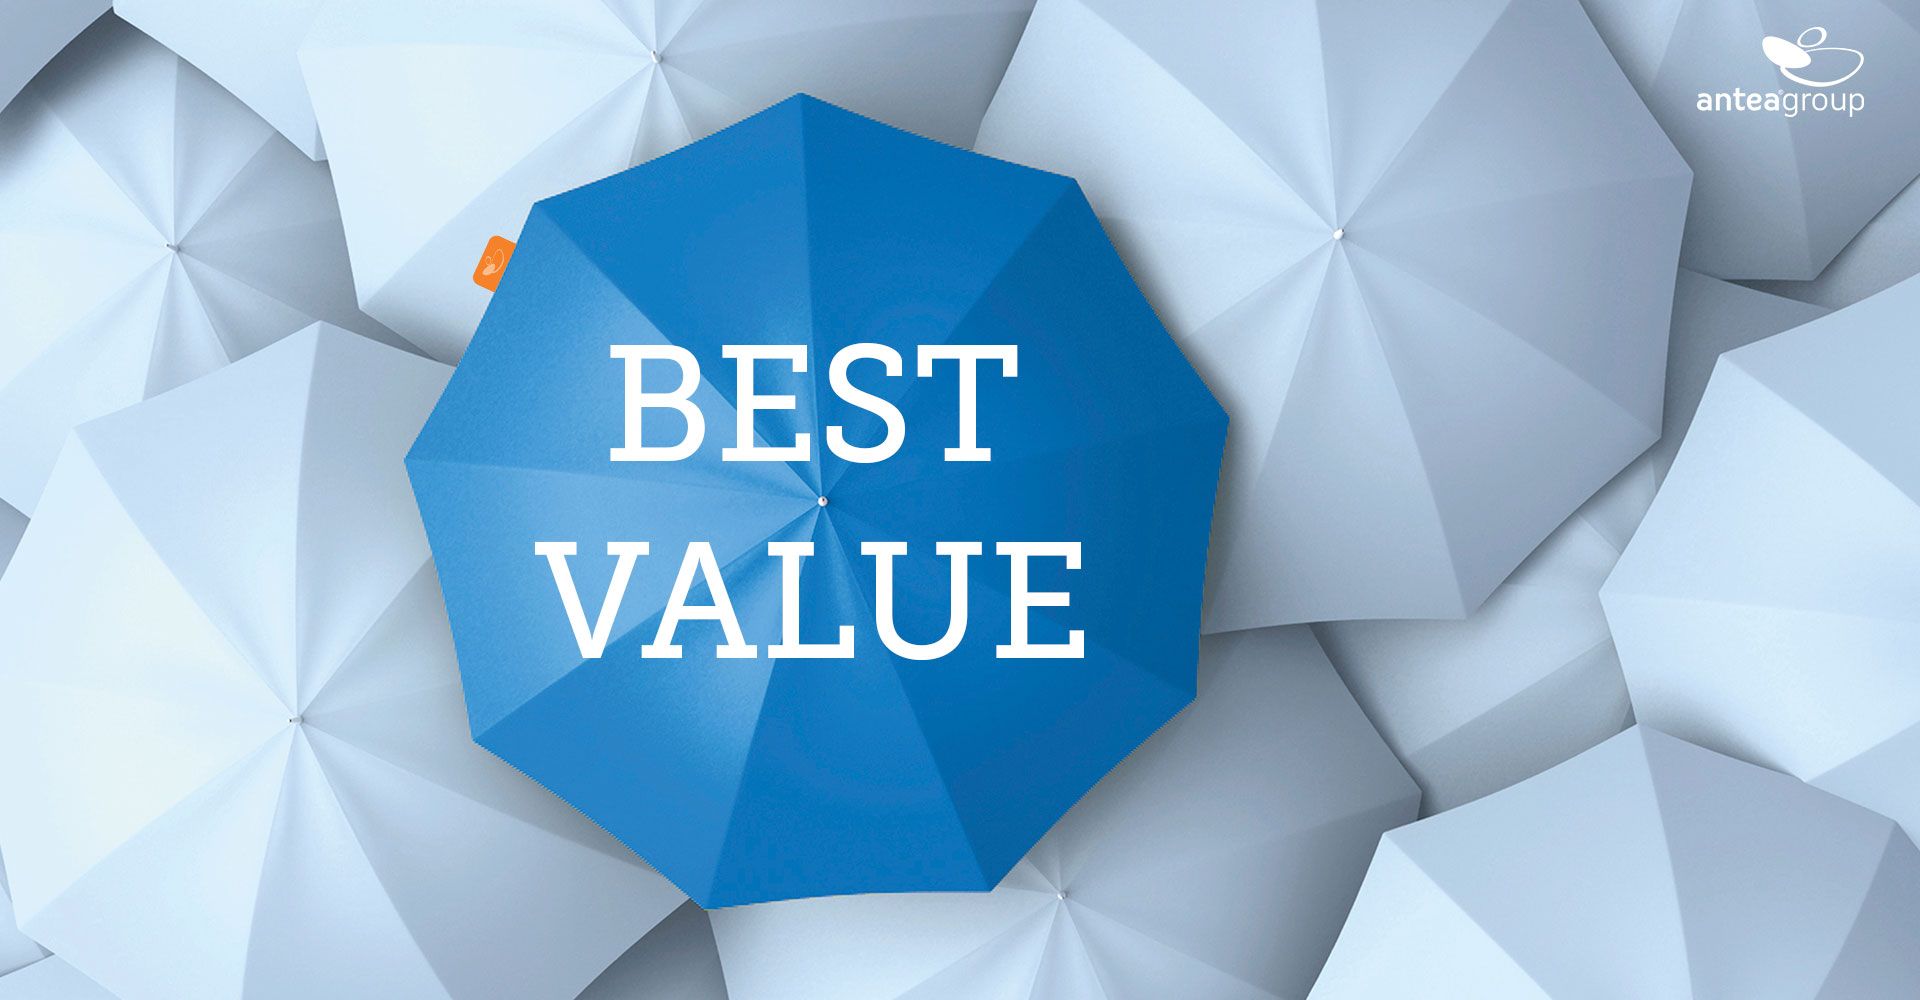 best-value-procurement-bvp-status-i-byggenaeringen